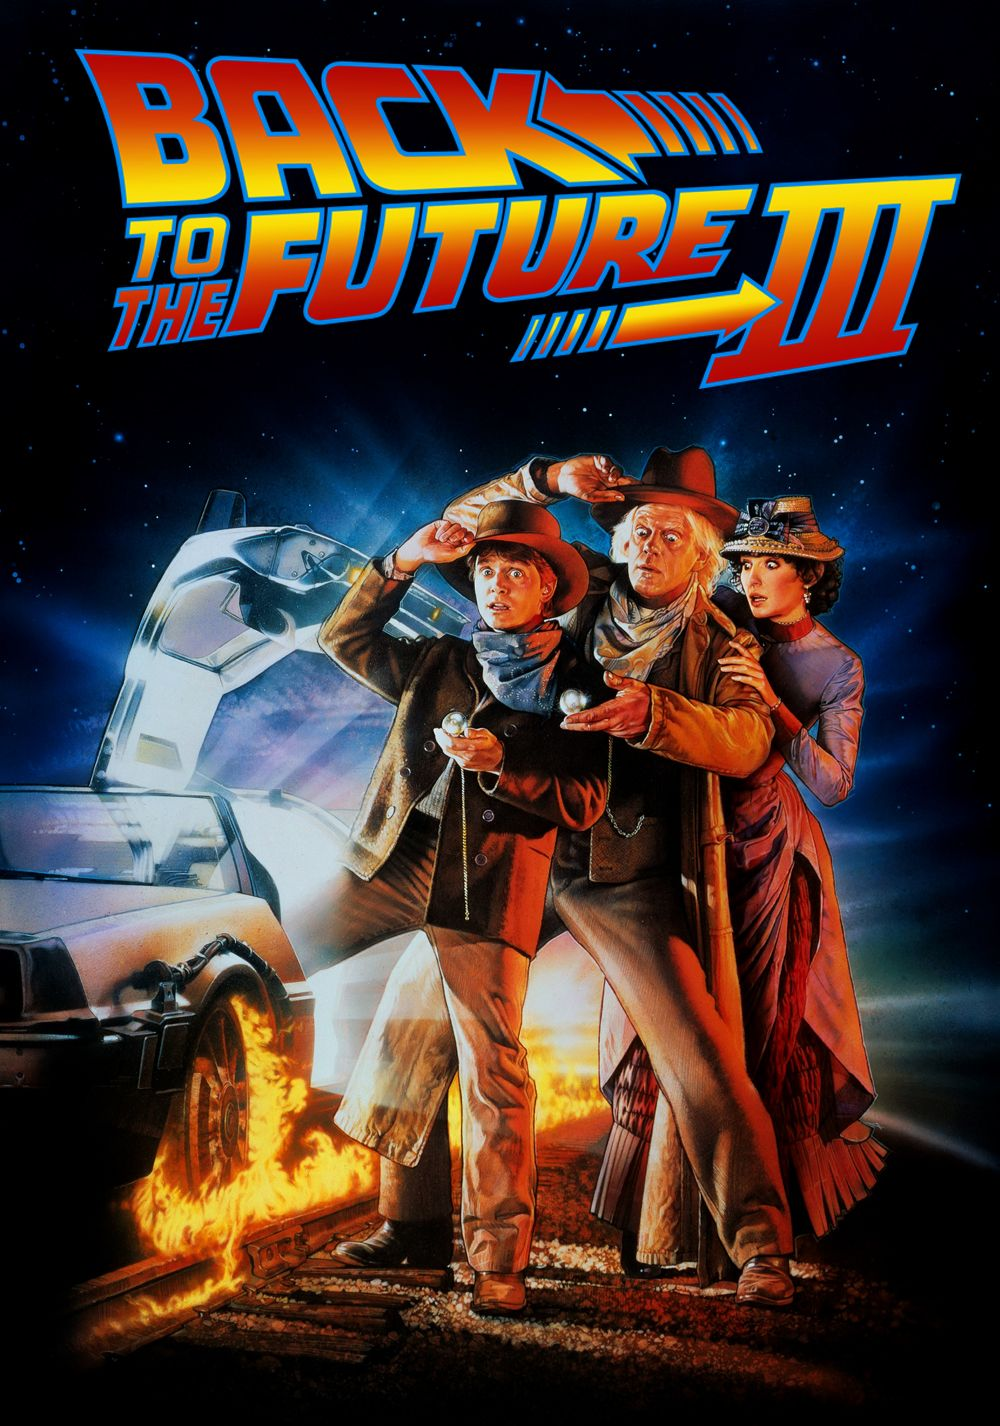 Back To The Future Part III (1990) 720p BluRay x264 AC3 Dual Audio [Hindi DD5.1 + English DD2.0]